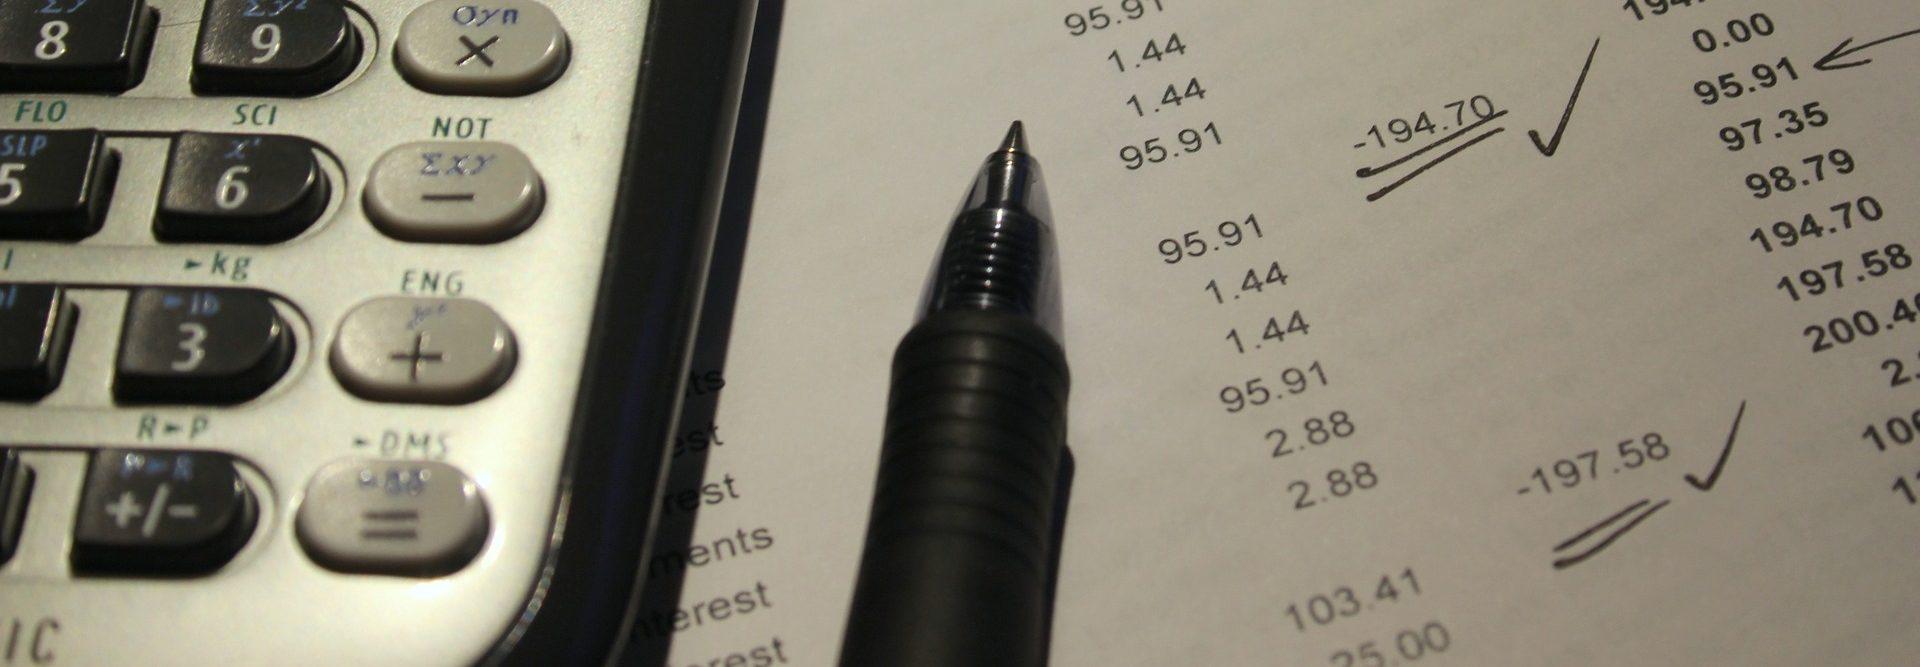 Progetto RESMYLE – Ricerca auditor esterno